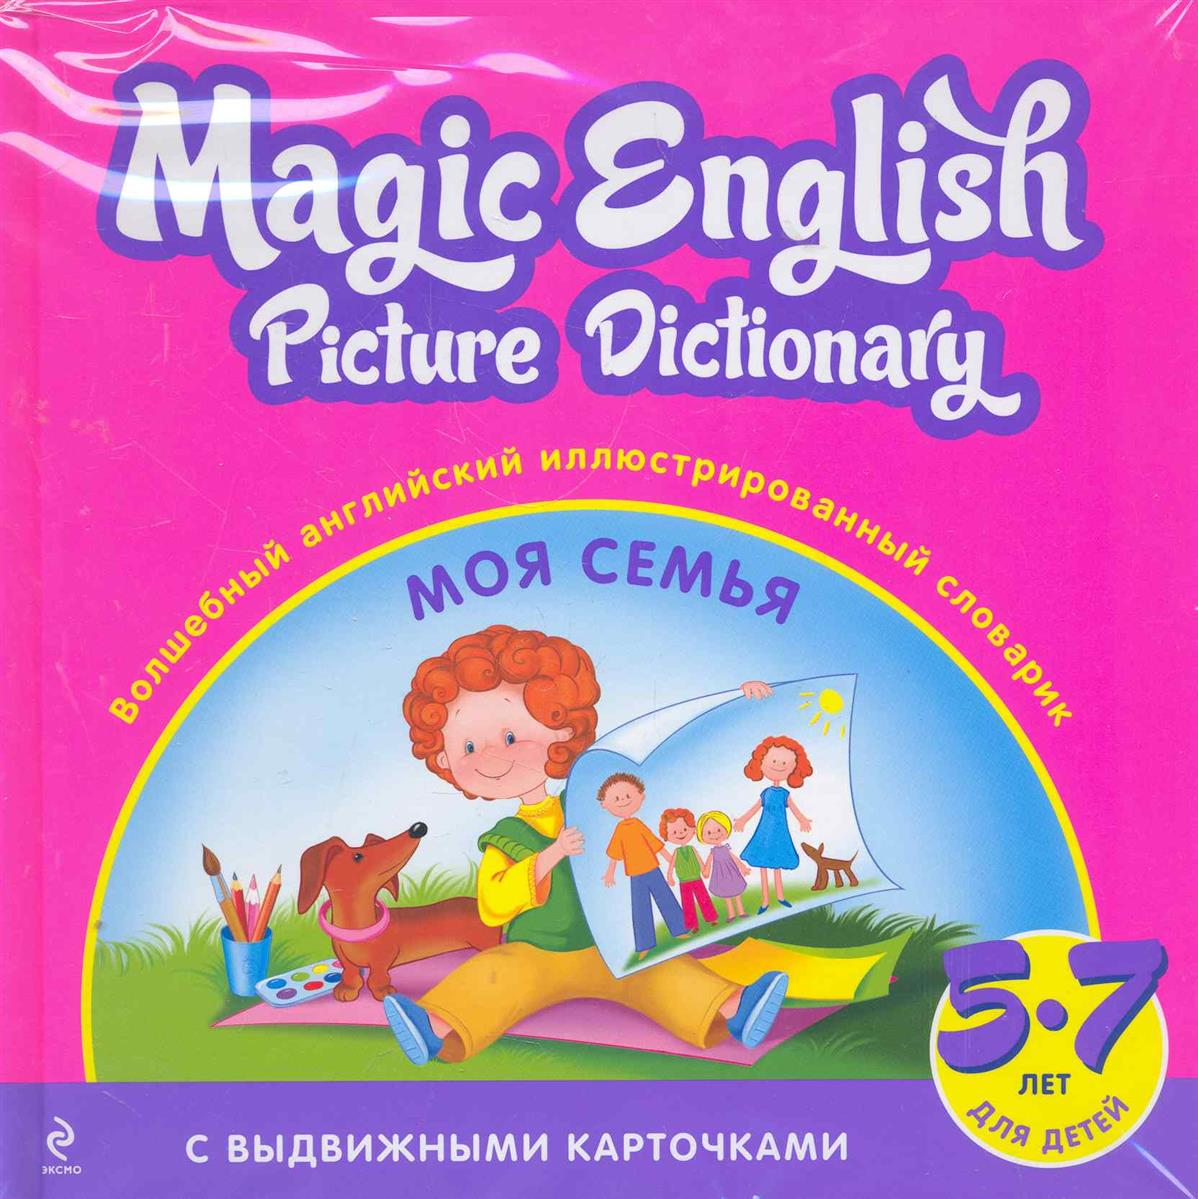 Magic English Picture Dictionary Волшебный англ. илл. словарик Моя семья korean picture dictionary korean english chinese japanese [223p 210 297 20mm]